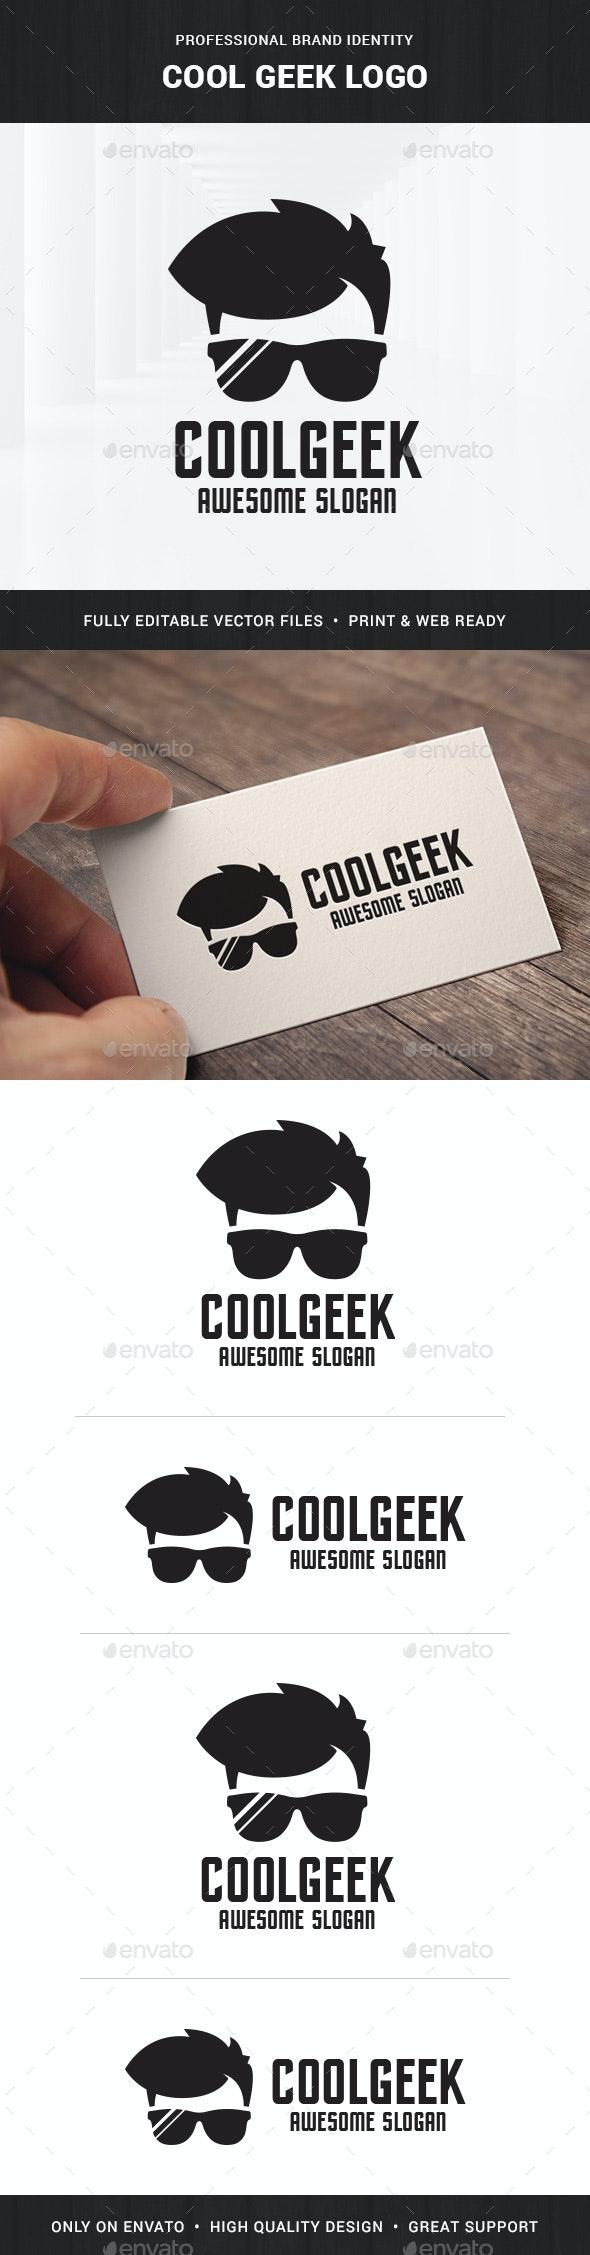 Cool Geek Logo v2